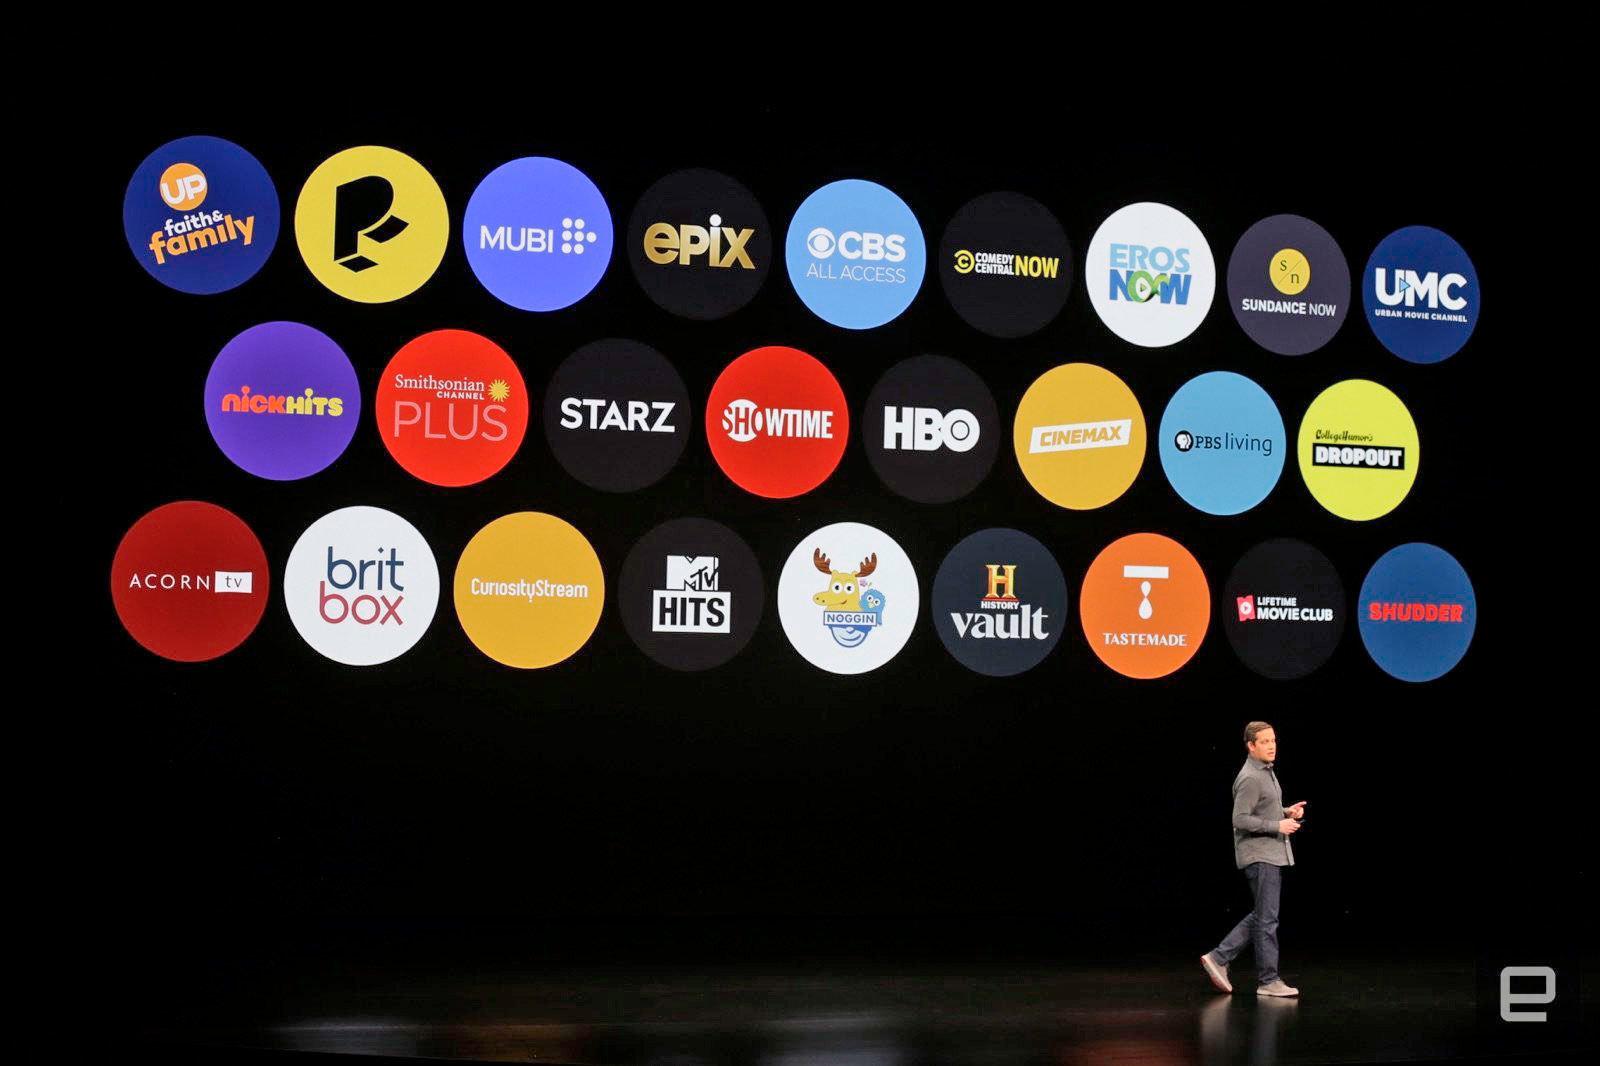 7584ca1ec2f9 Το iOS 12.3 κυκλοφορεί τώρα με την αναβαθμισμένη εφαρμογή τηλεόρασης ...